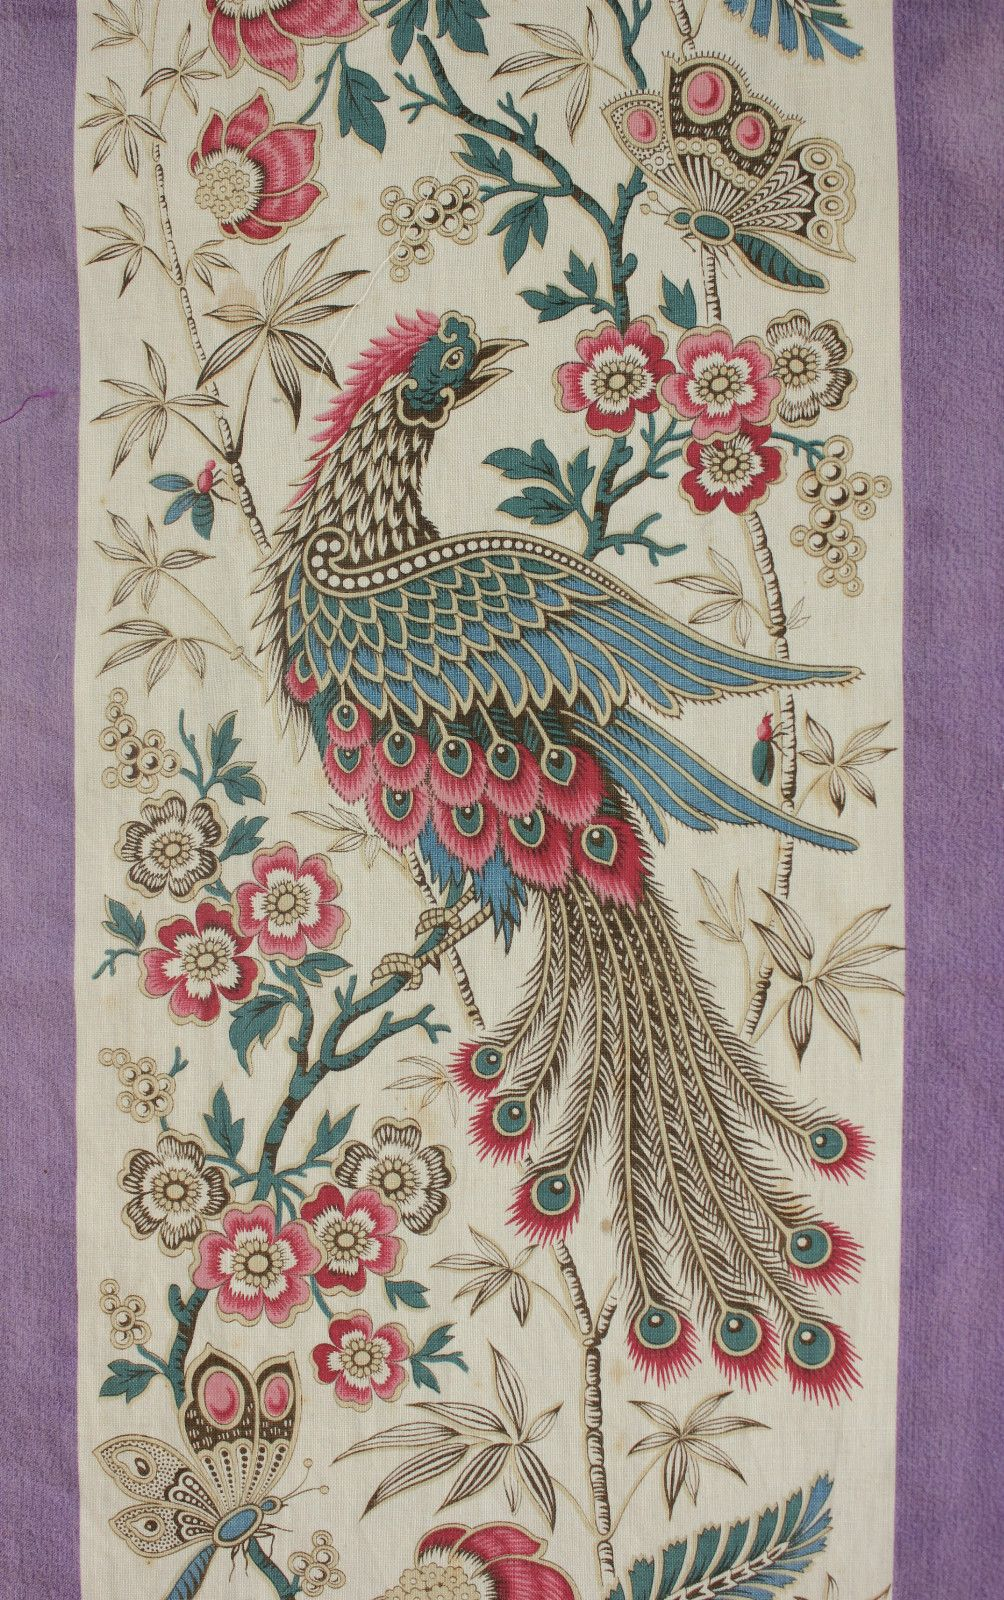 Antique Vtg French Indienne Batik Floral Bird Cotton Fabric ~ Blue Red Green ~